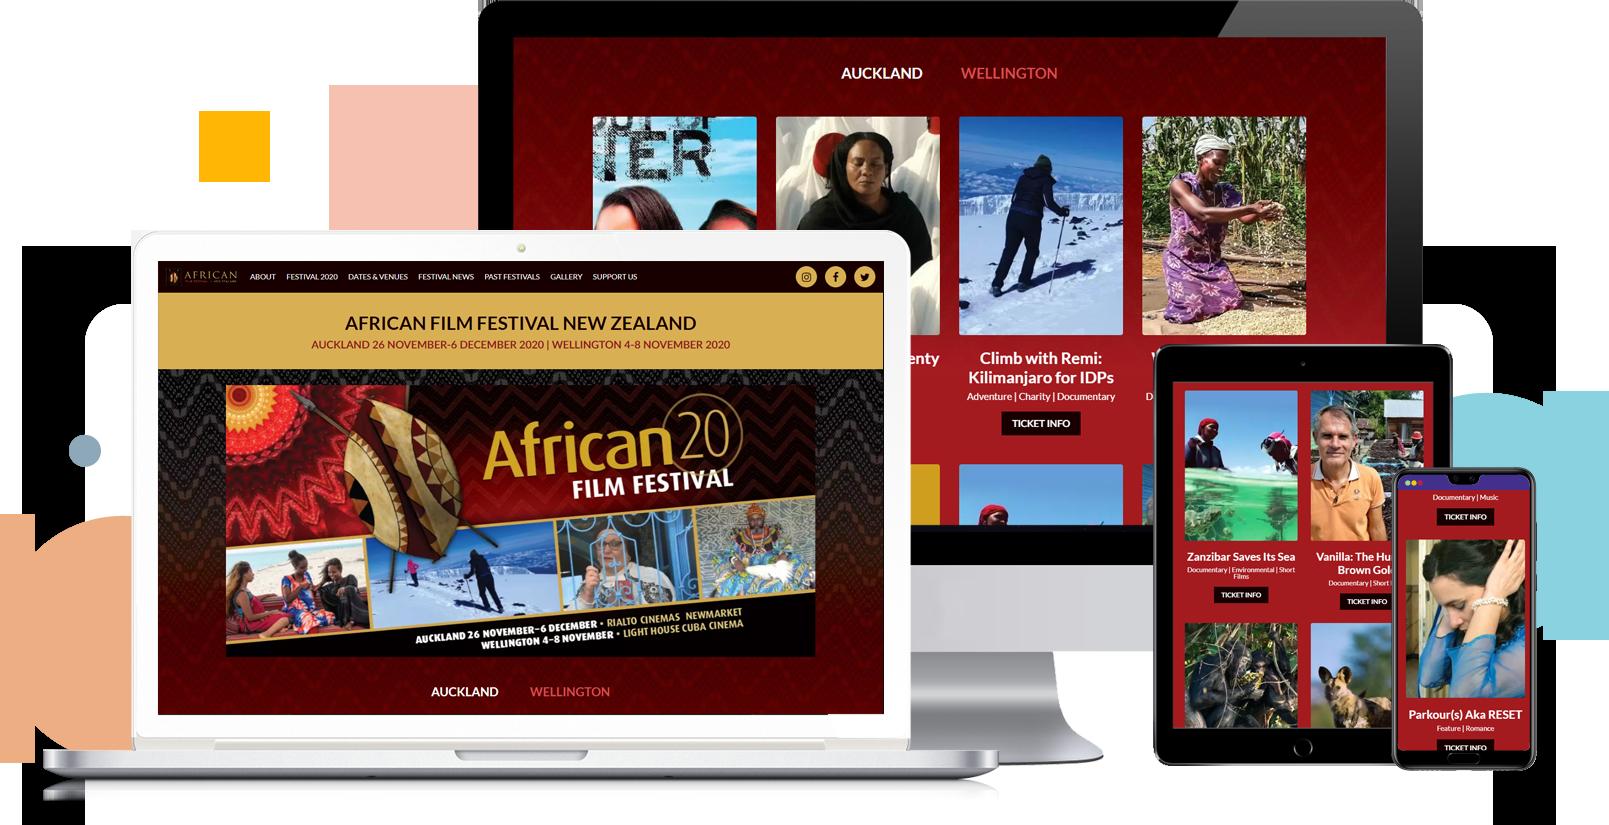 AfricanFilmFestivalSampleImages